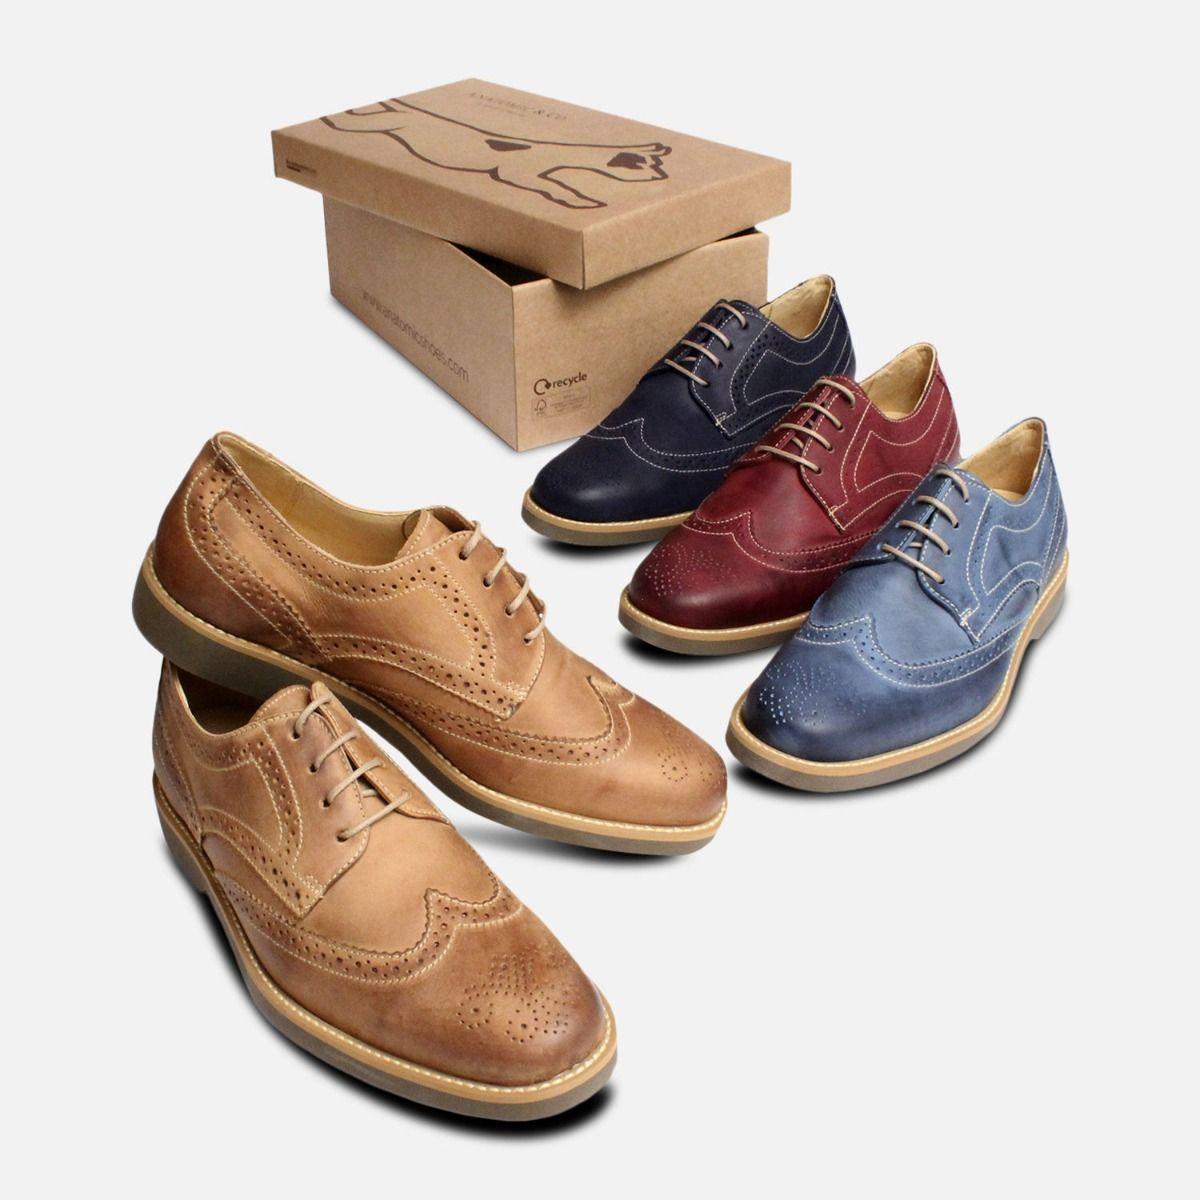 Burgundy Mens Brogues Oxblood Anatomic Shoes